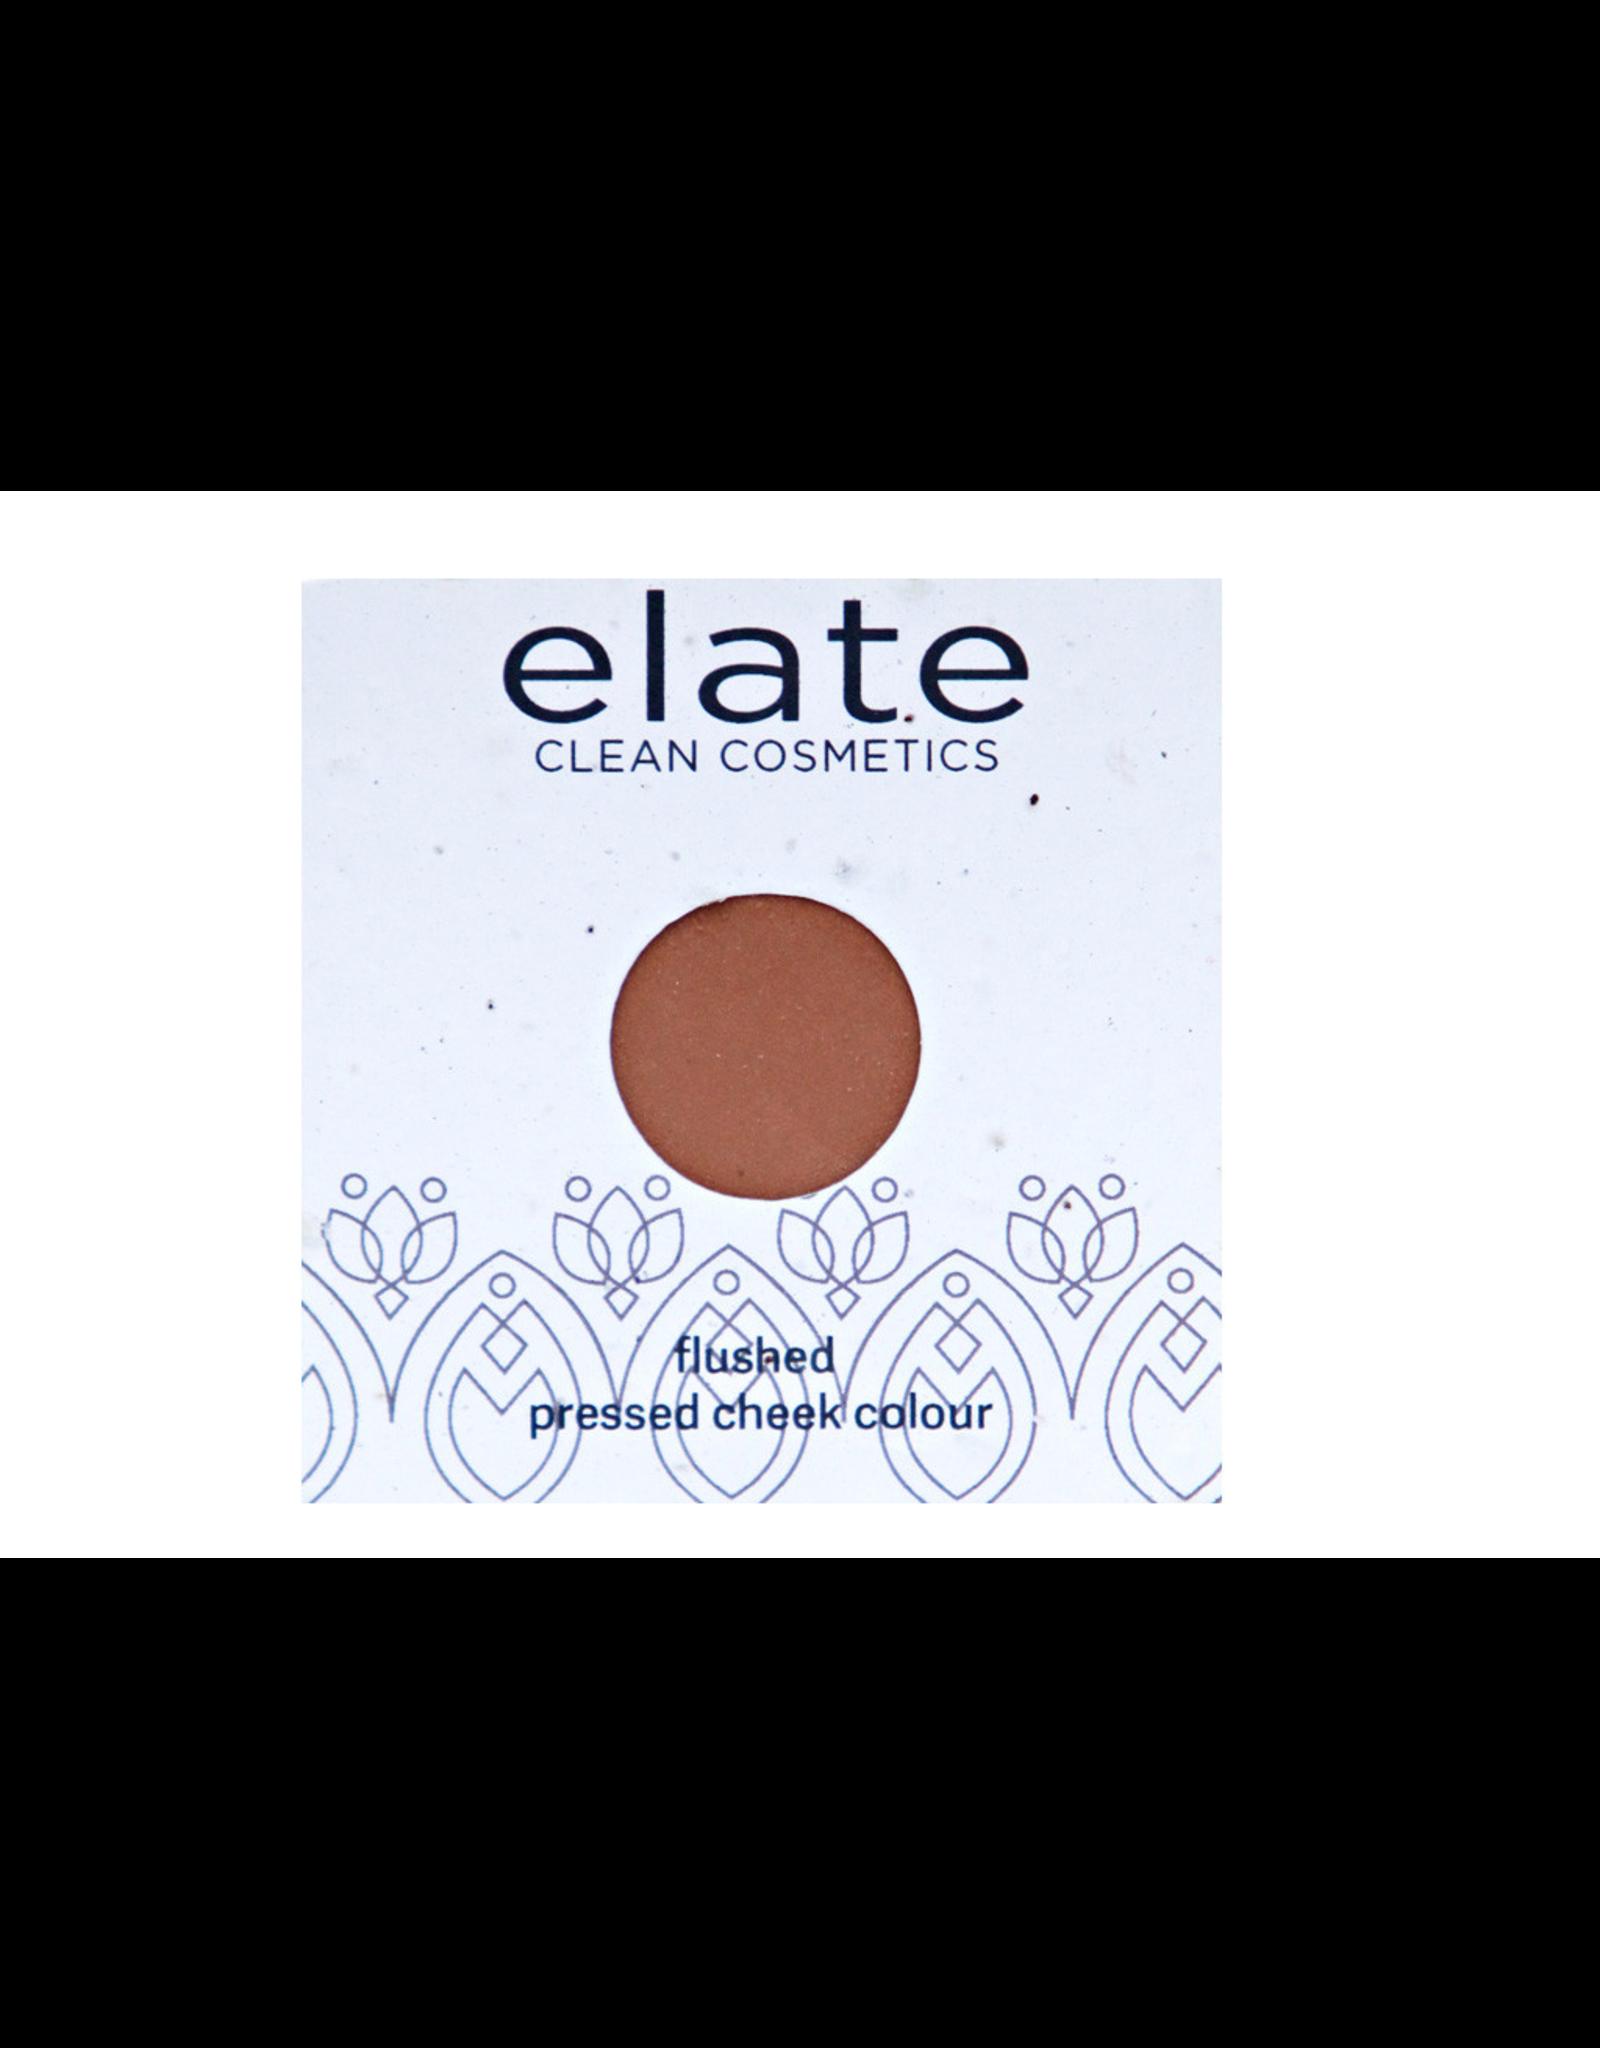 ELATE Flushed Pressed Cheek Colour (Blush & Bronzer) - Sunbeam